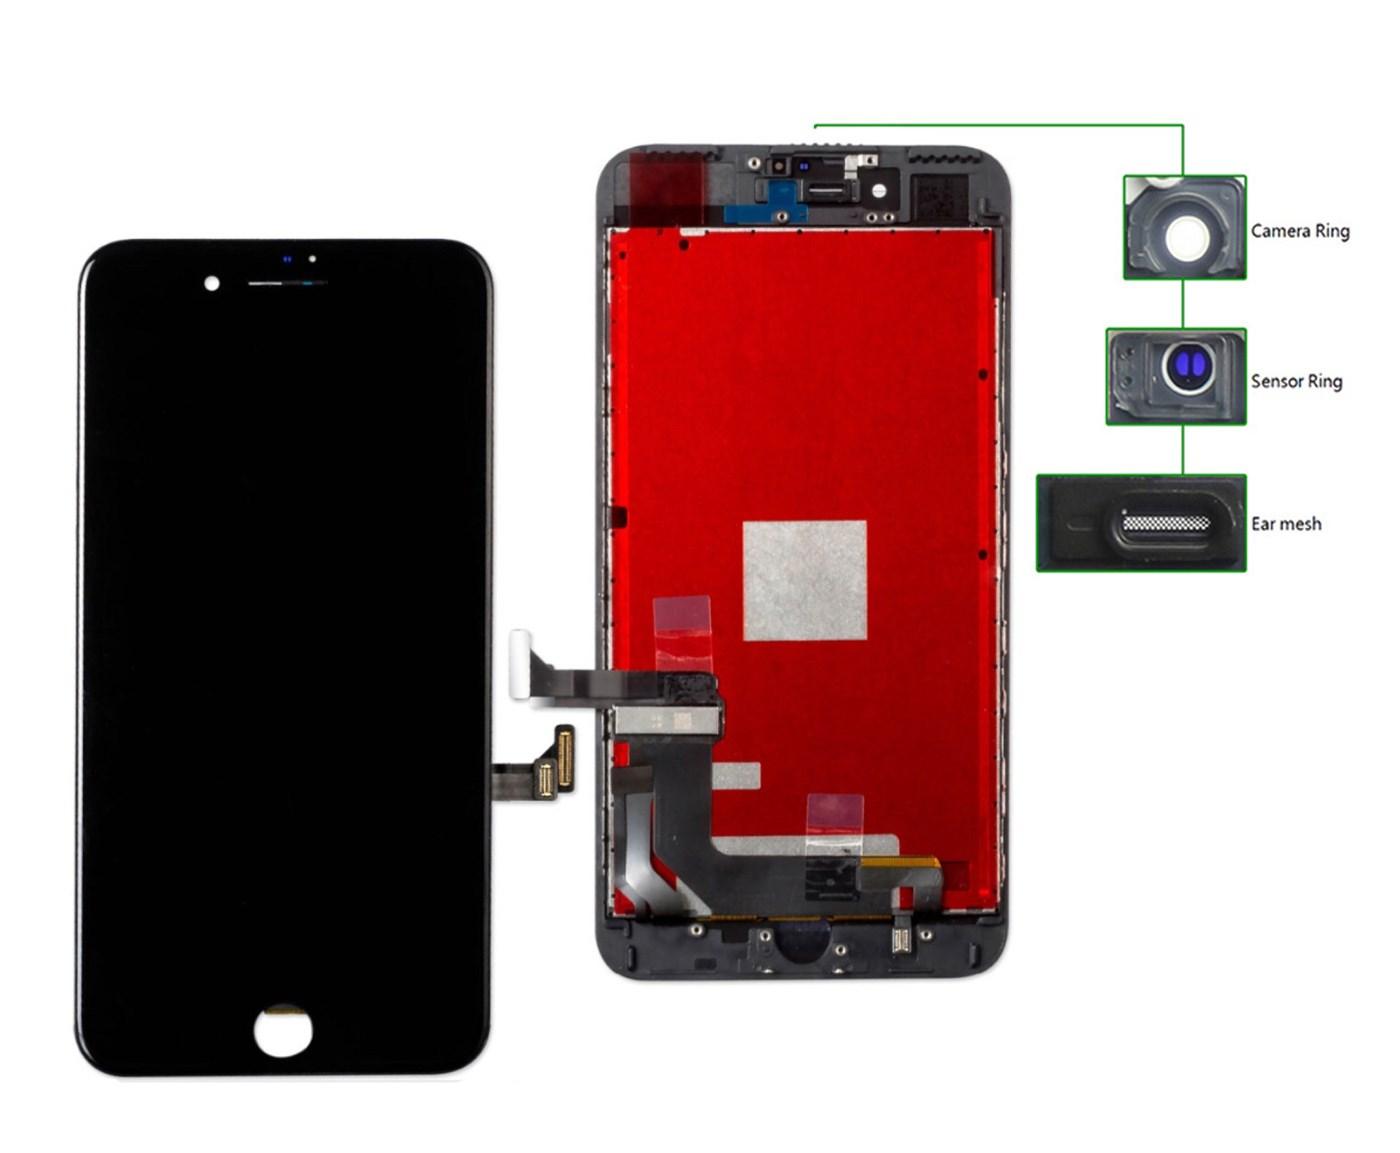 TIANMA High Copy LCD iPhone 8 Plus, Camera-Sensor ring, ear mesh, Black - TIANMA 21639